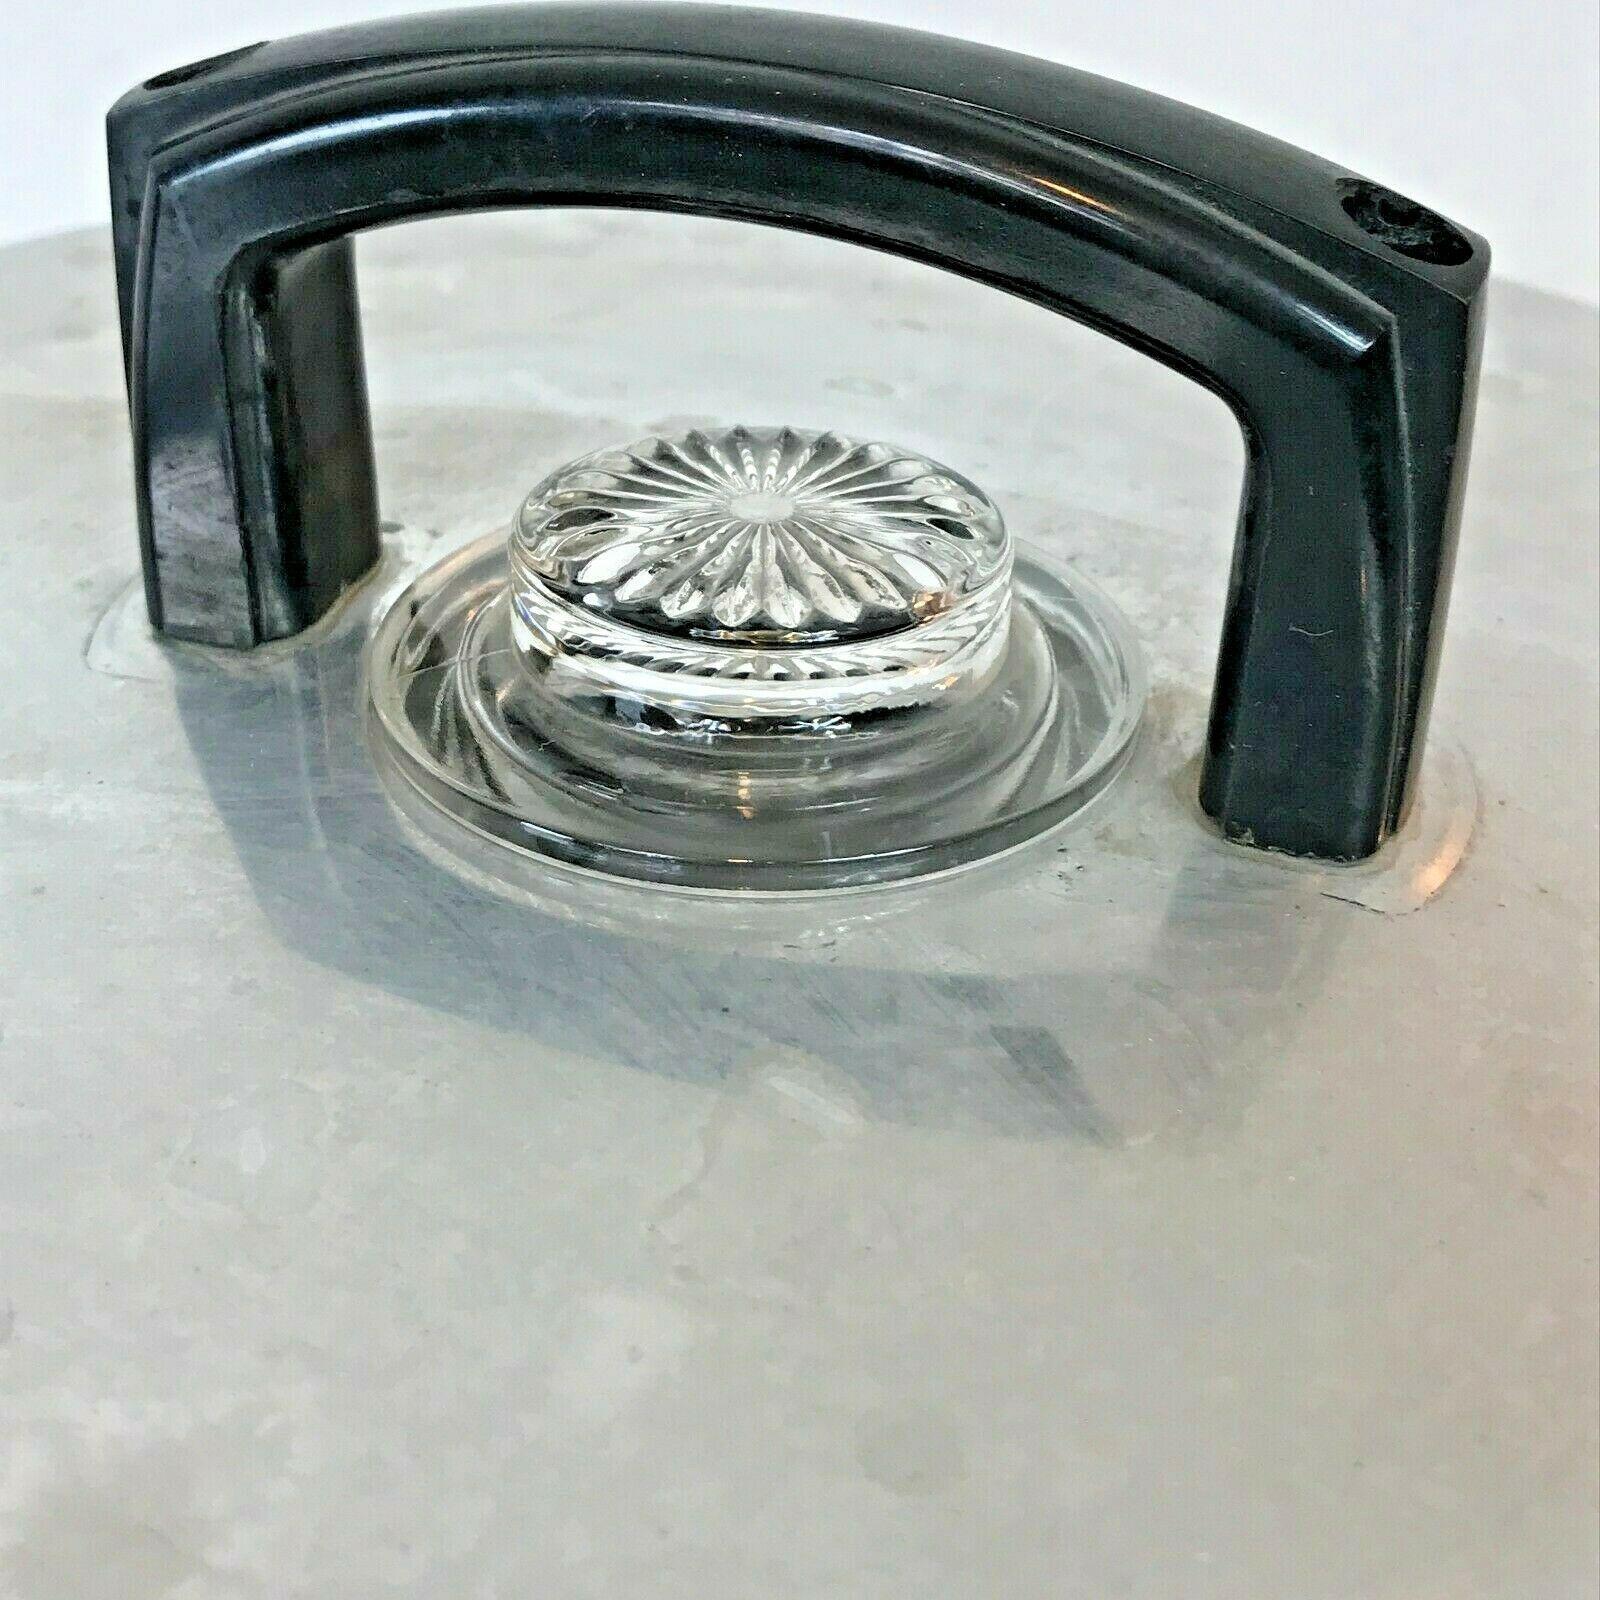 Vintage Enterprise Coffee Percolator 58 cup Urn Model AP48N WORKS Glass Knob LB image 2